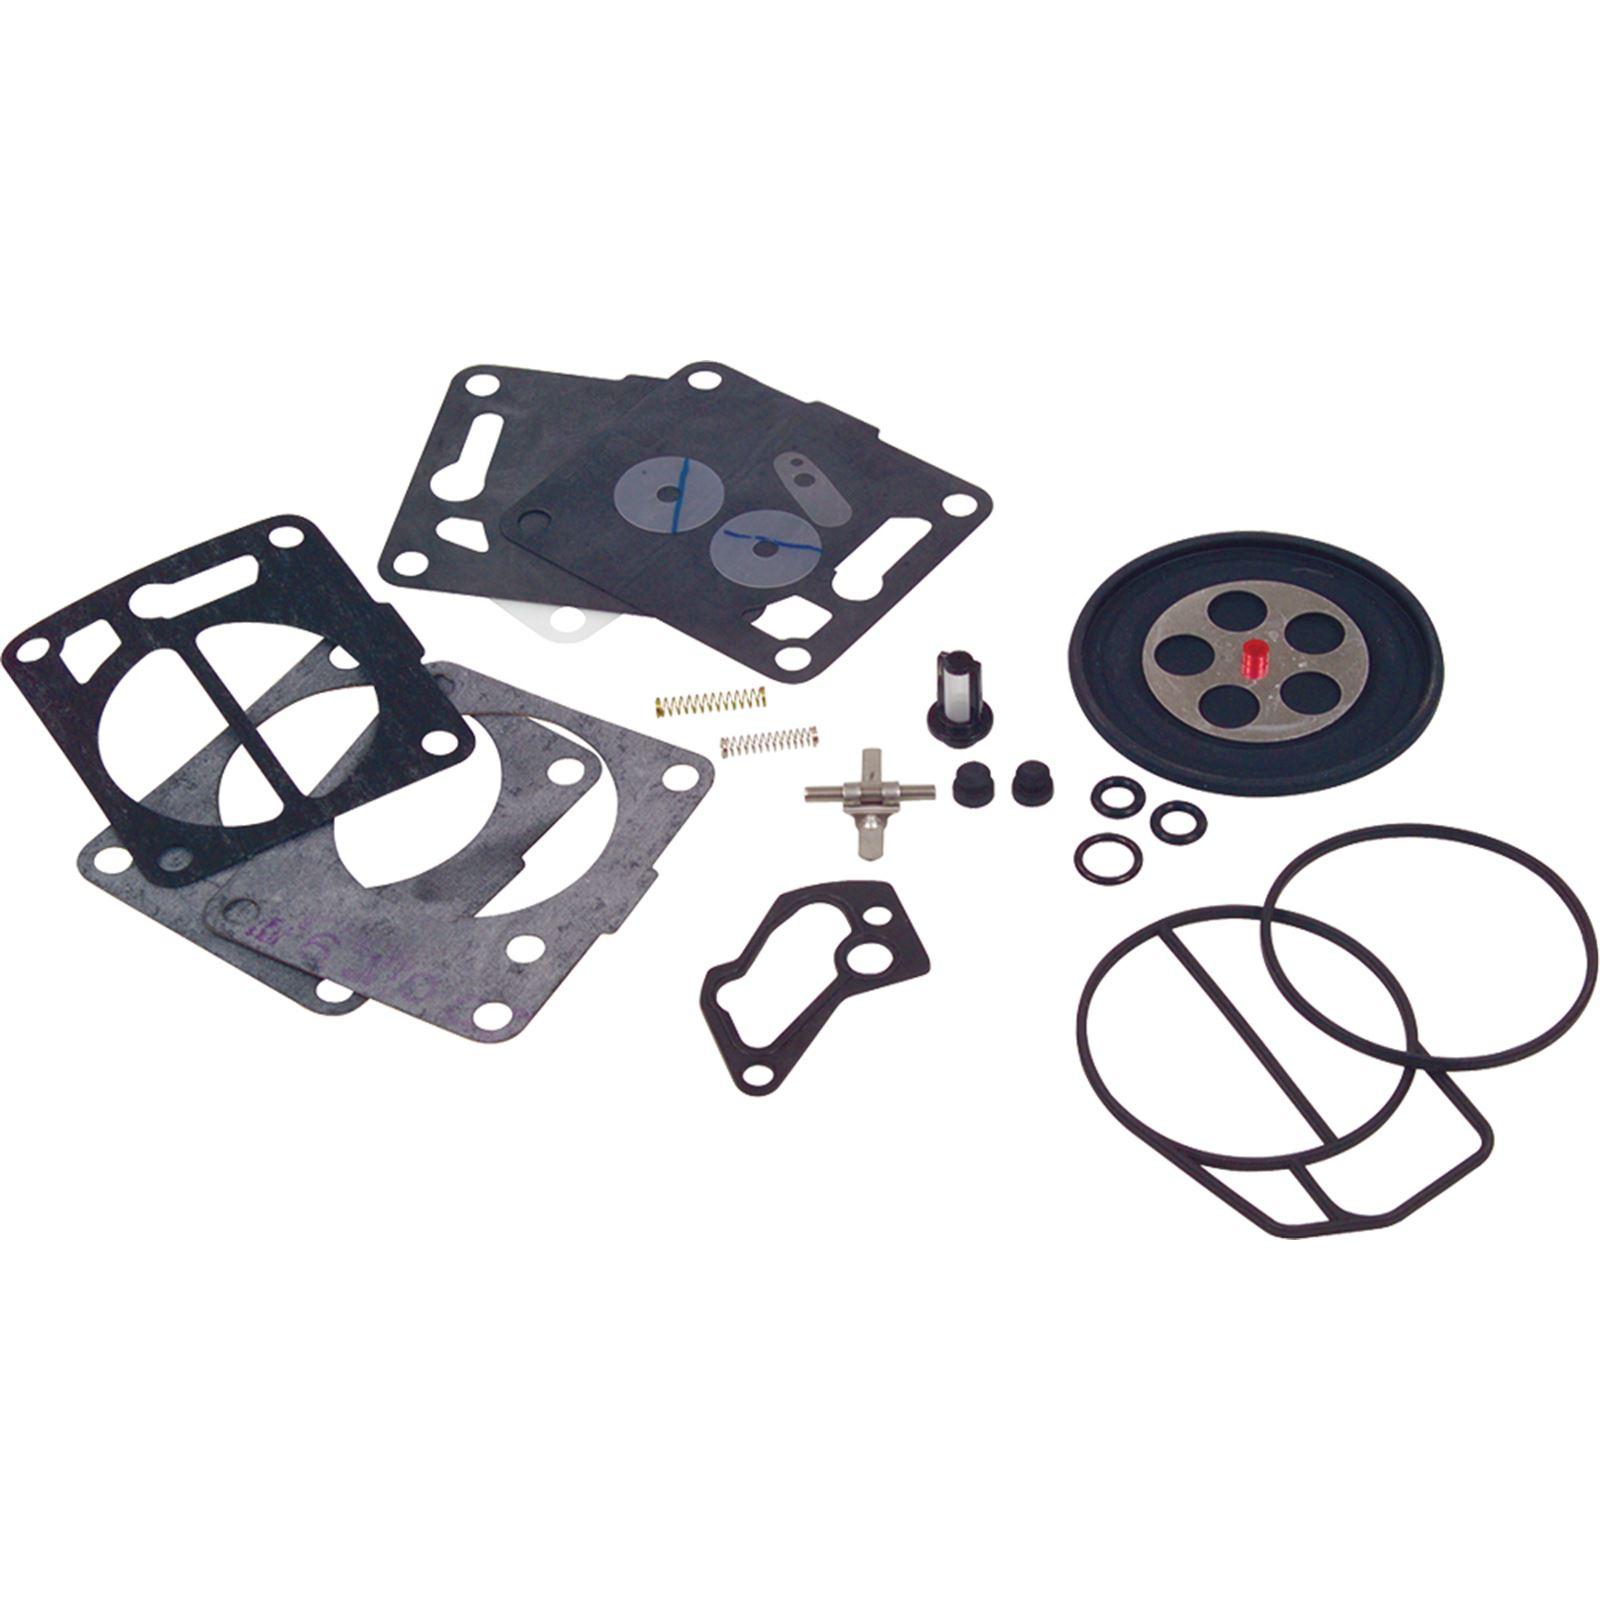 Mikuni Carburetor/Fuel Pump Rebuild Kit